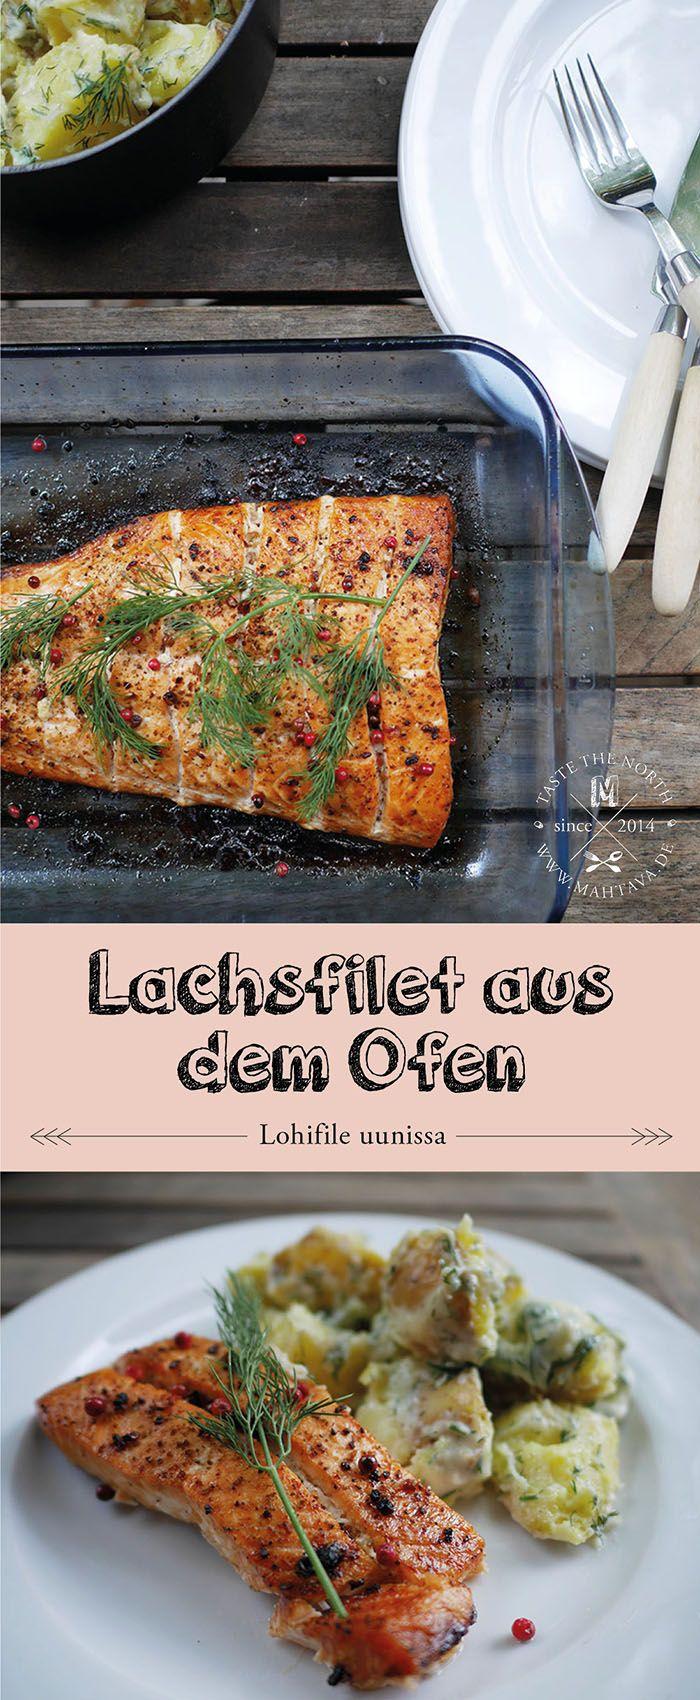 Finnische Küche: Lachsfilet aus dem Ofen I Lohifile uunissa I Oven baked salmon www.mahtava.de